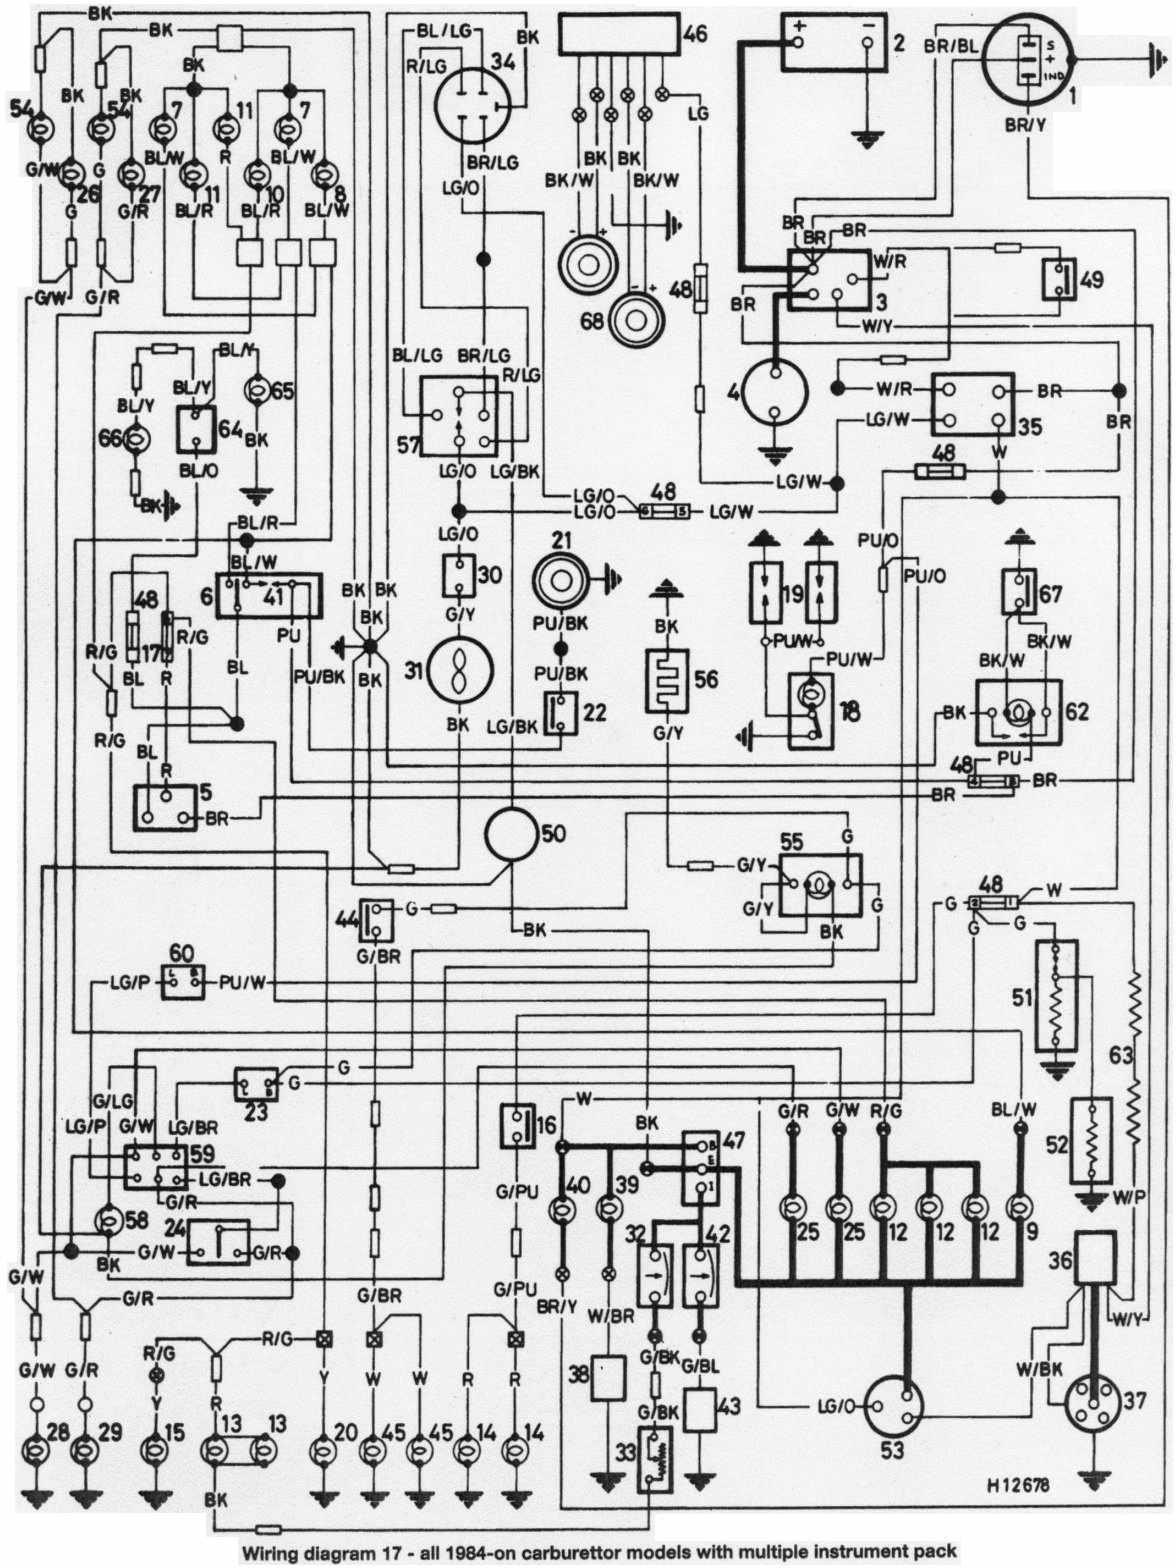 Honda dio wiring diagram wiring diagrams schematics honda dio wiring diagram apartment layout planner excellent honda elite wiring diagram images best image wiring wiring diagram of 1984 onwards all mini swarovskicordoba Images